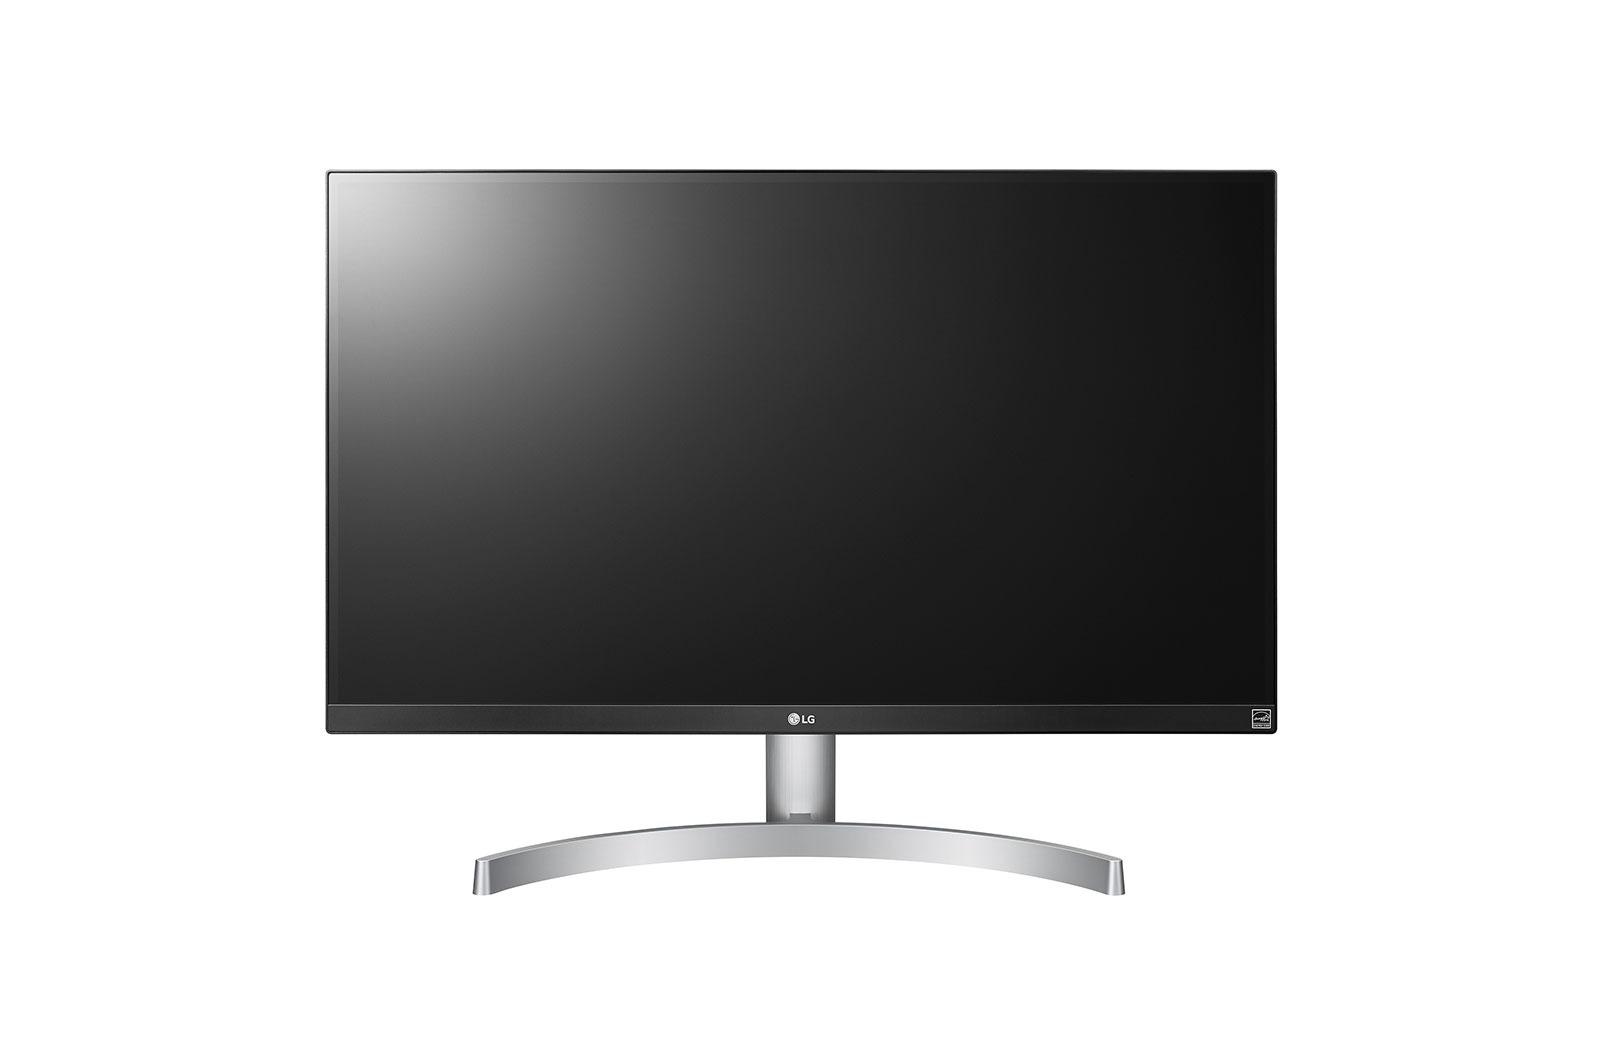 Korting LG 27UL600 W monitor